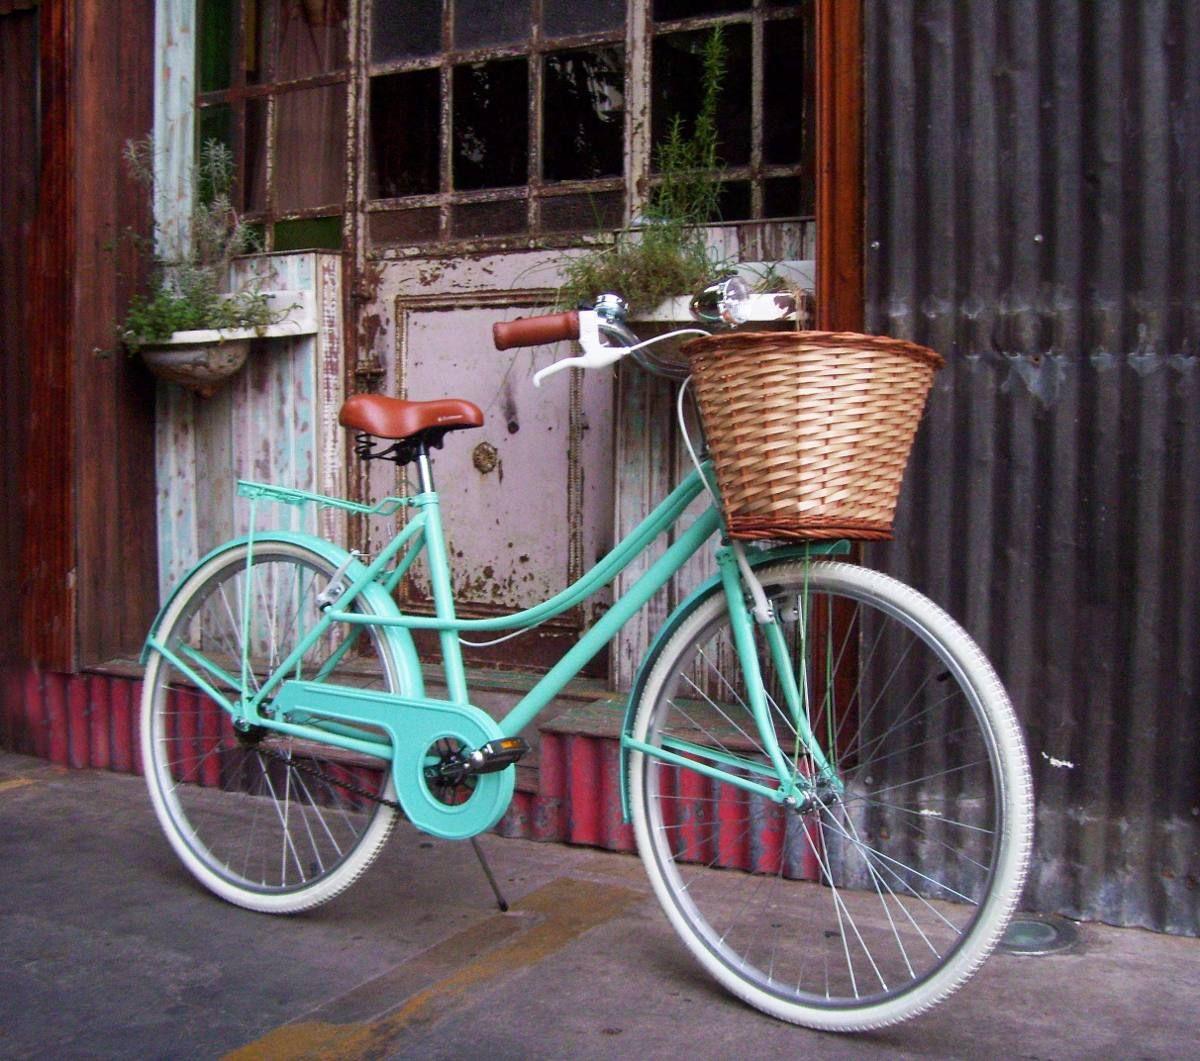 Bicleta Retro Vintage Rodado 26 Oportunidad 4 000 00 Imagenes De Bicicletas Bicicleta Retro Vintage Bicicletas Retro